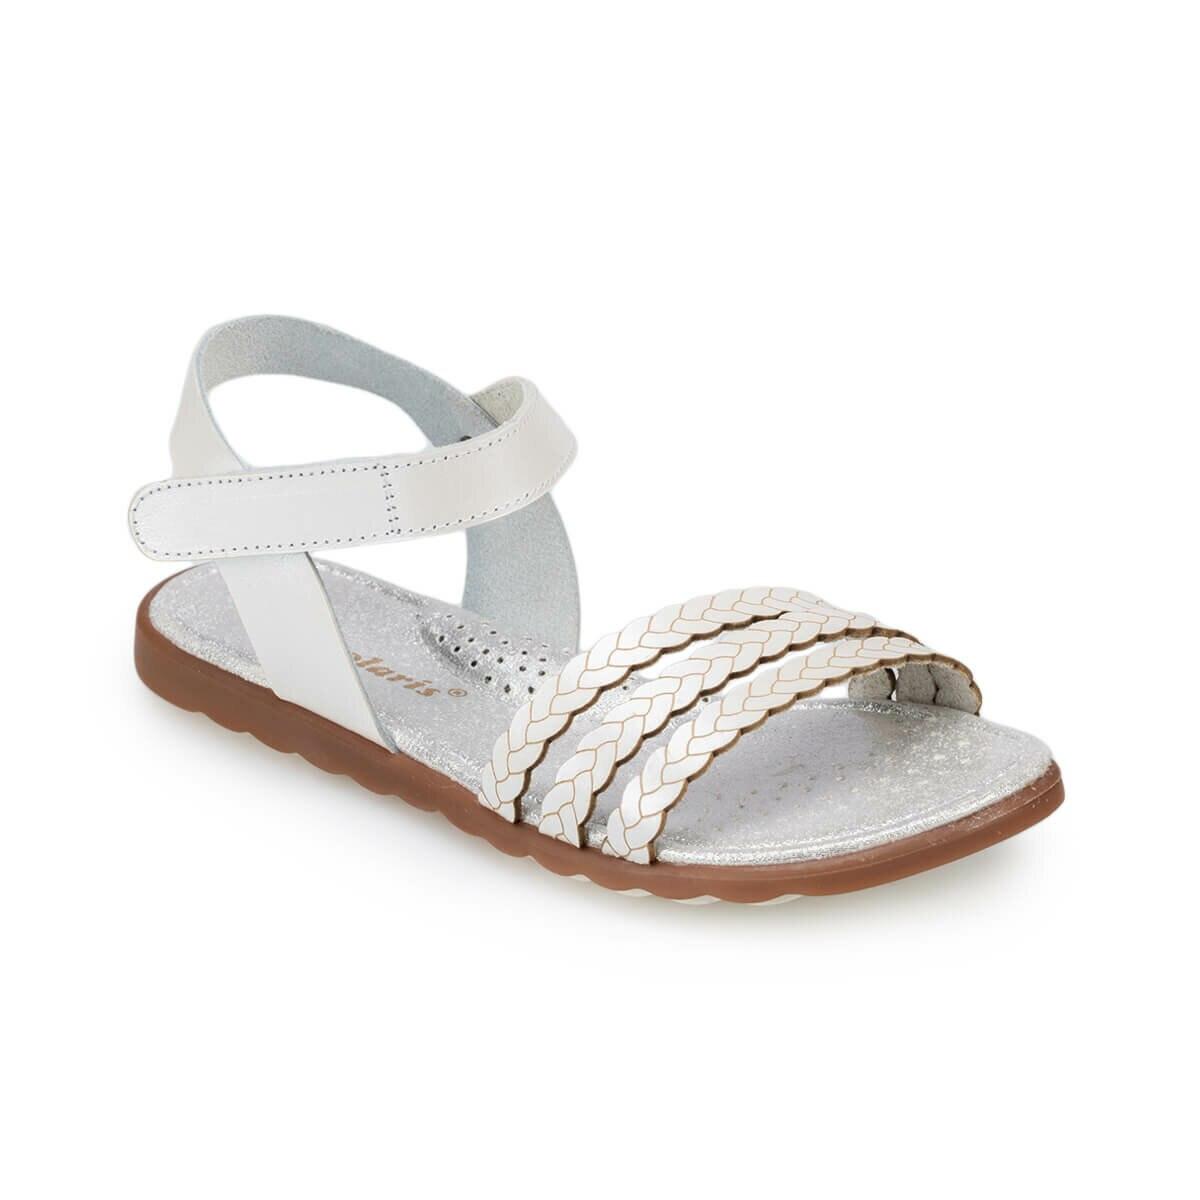 FLO 91.511351.F White Female Child Sandals Polaris